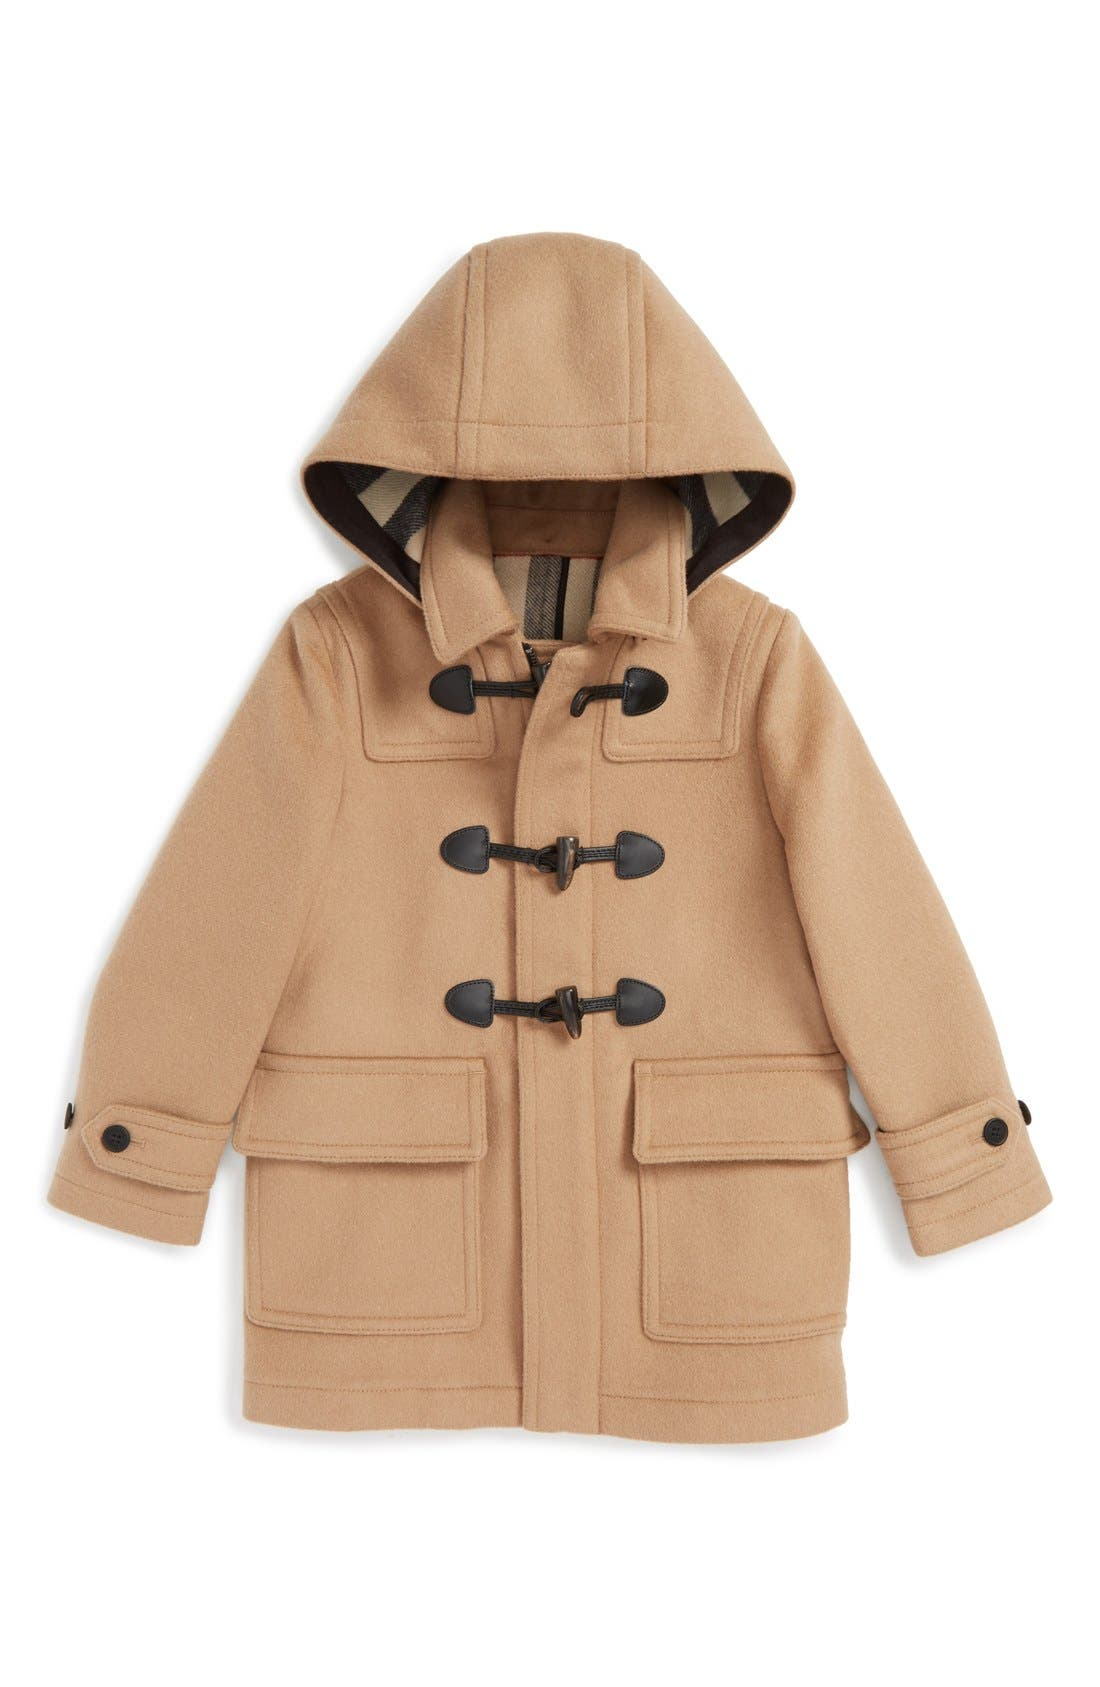 Burberry 'Burwood' Wool Toggle Coat (Little Boys & Big Boys)